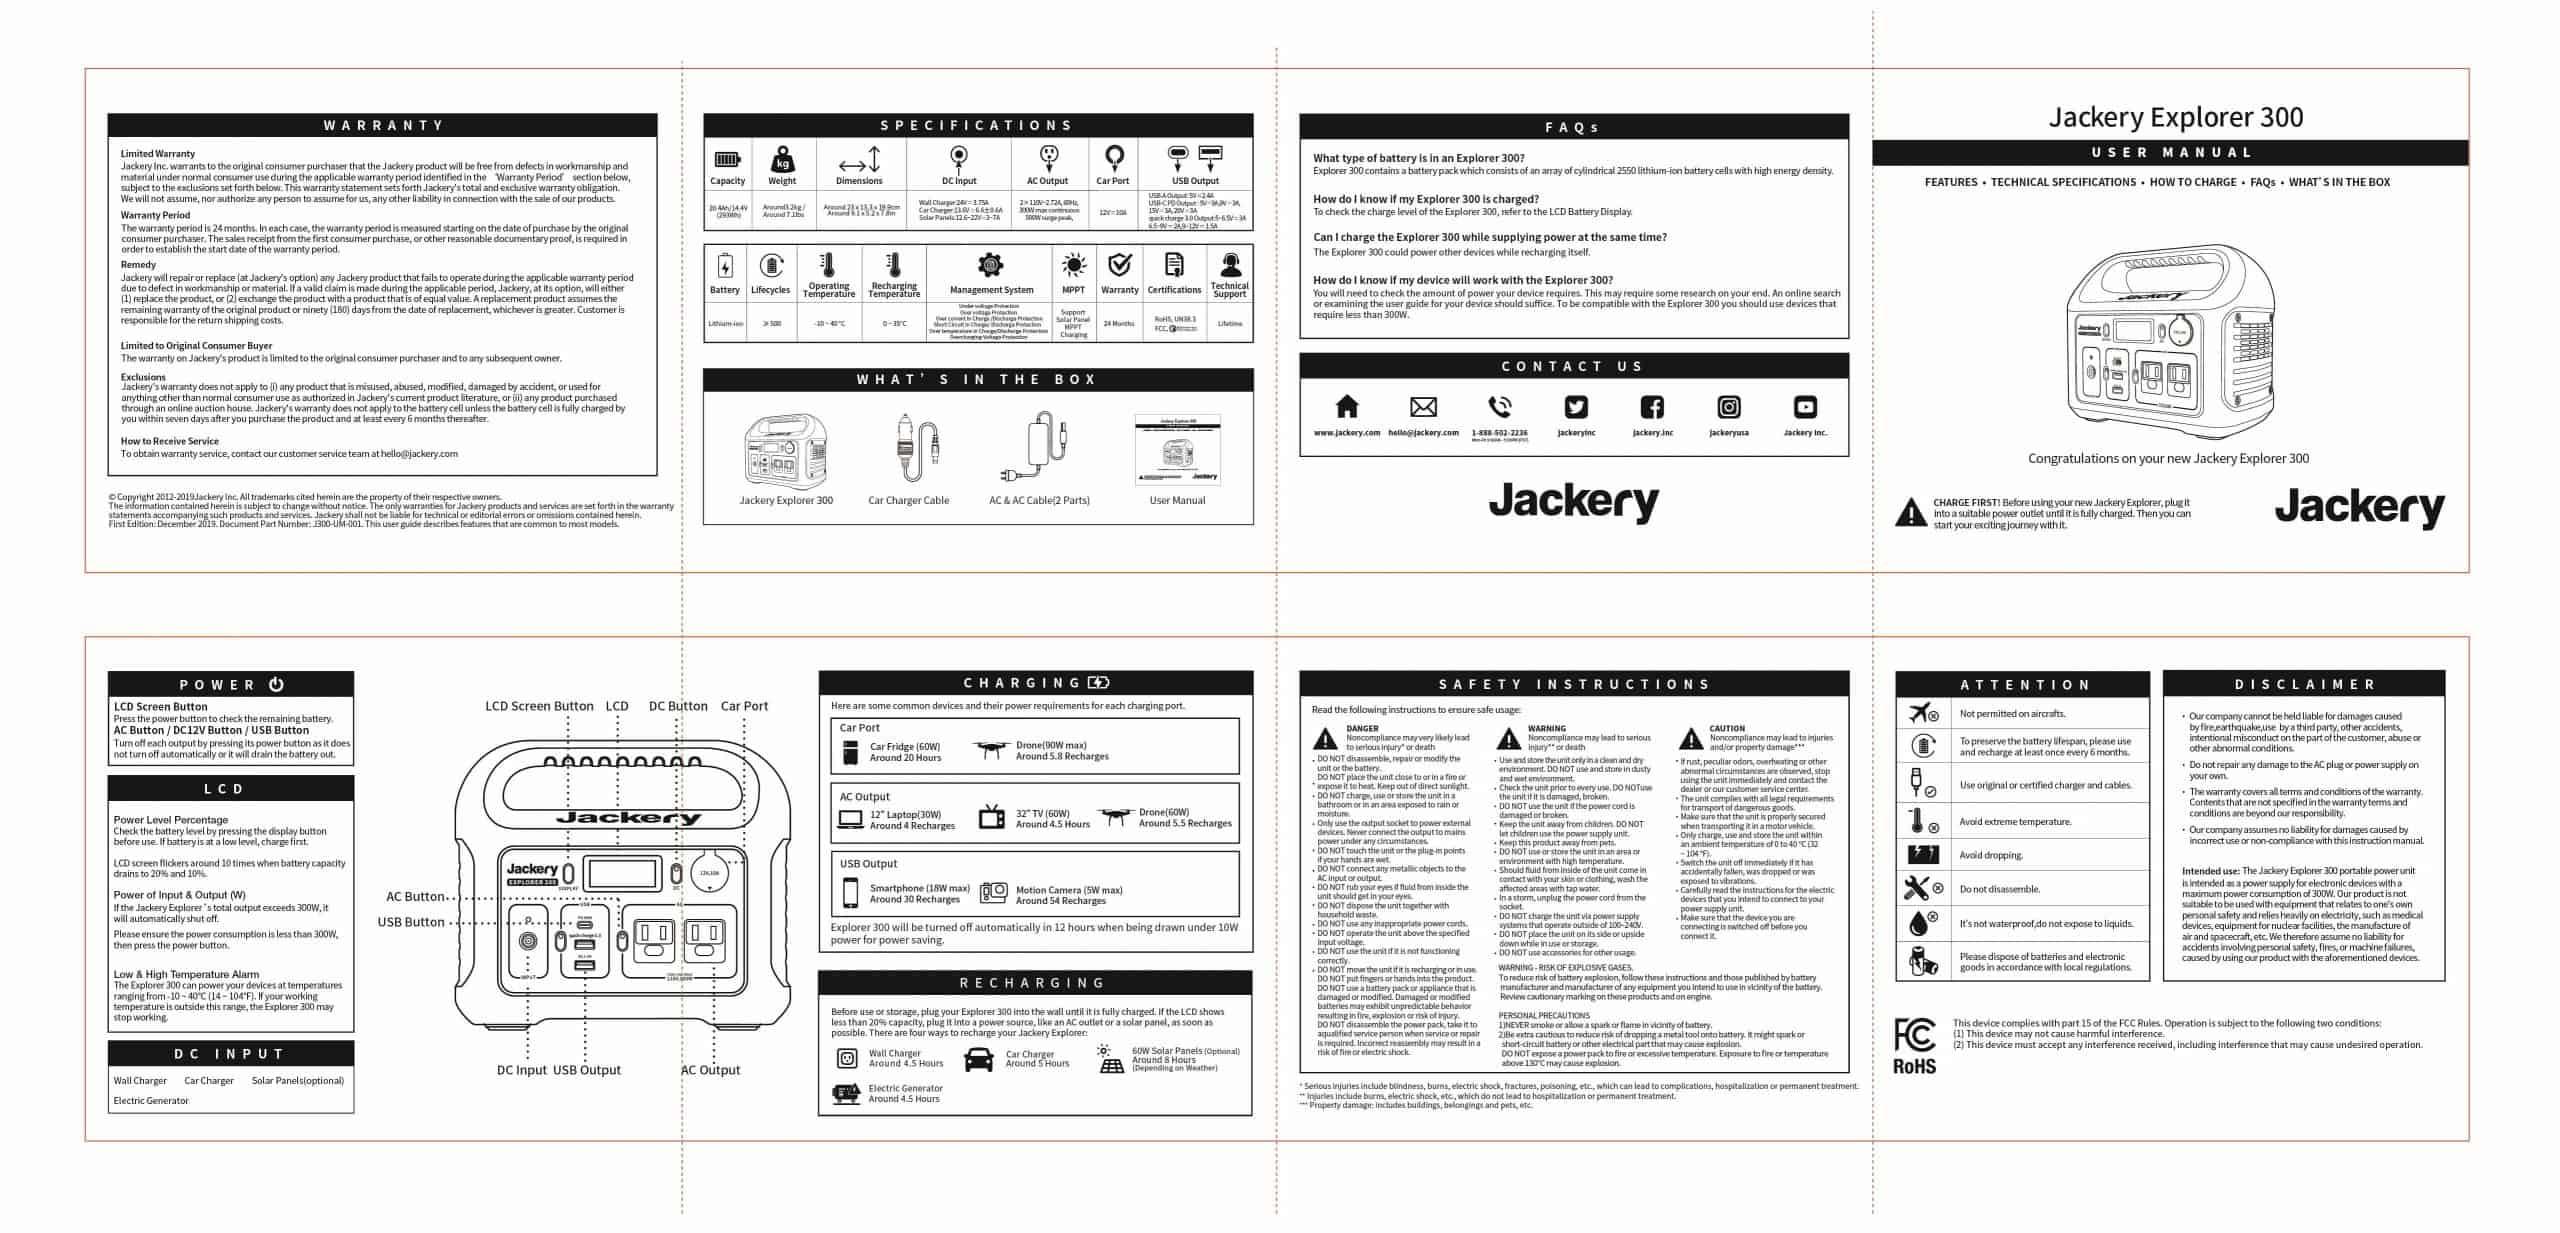 jackery 300 user manual